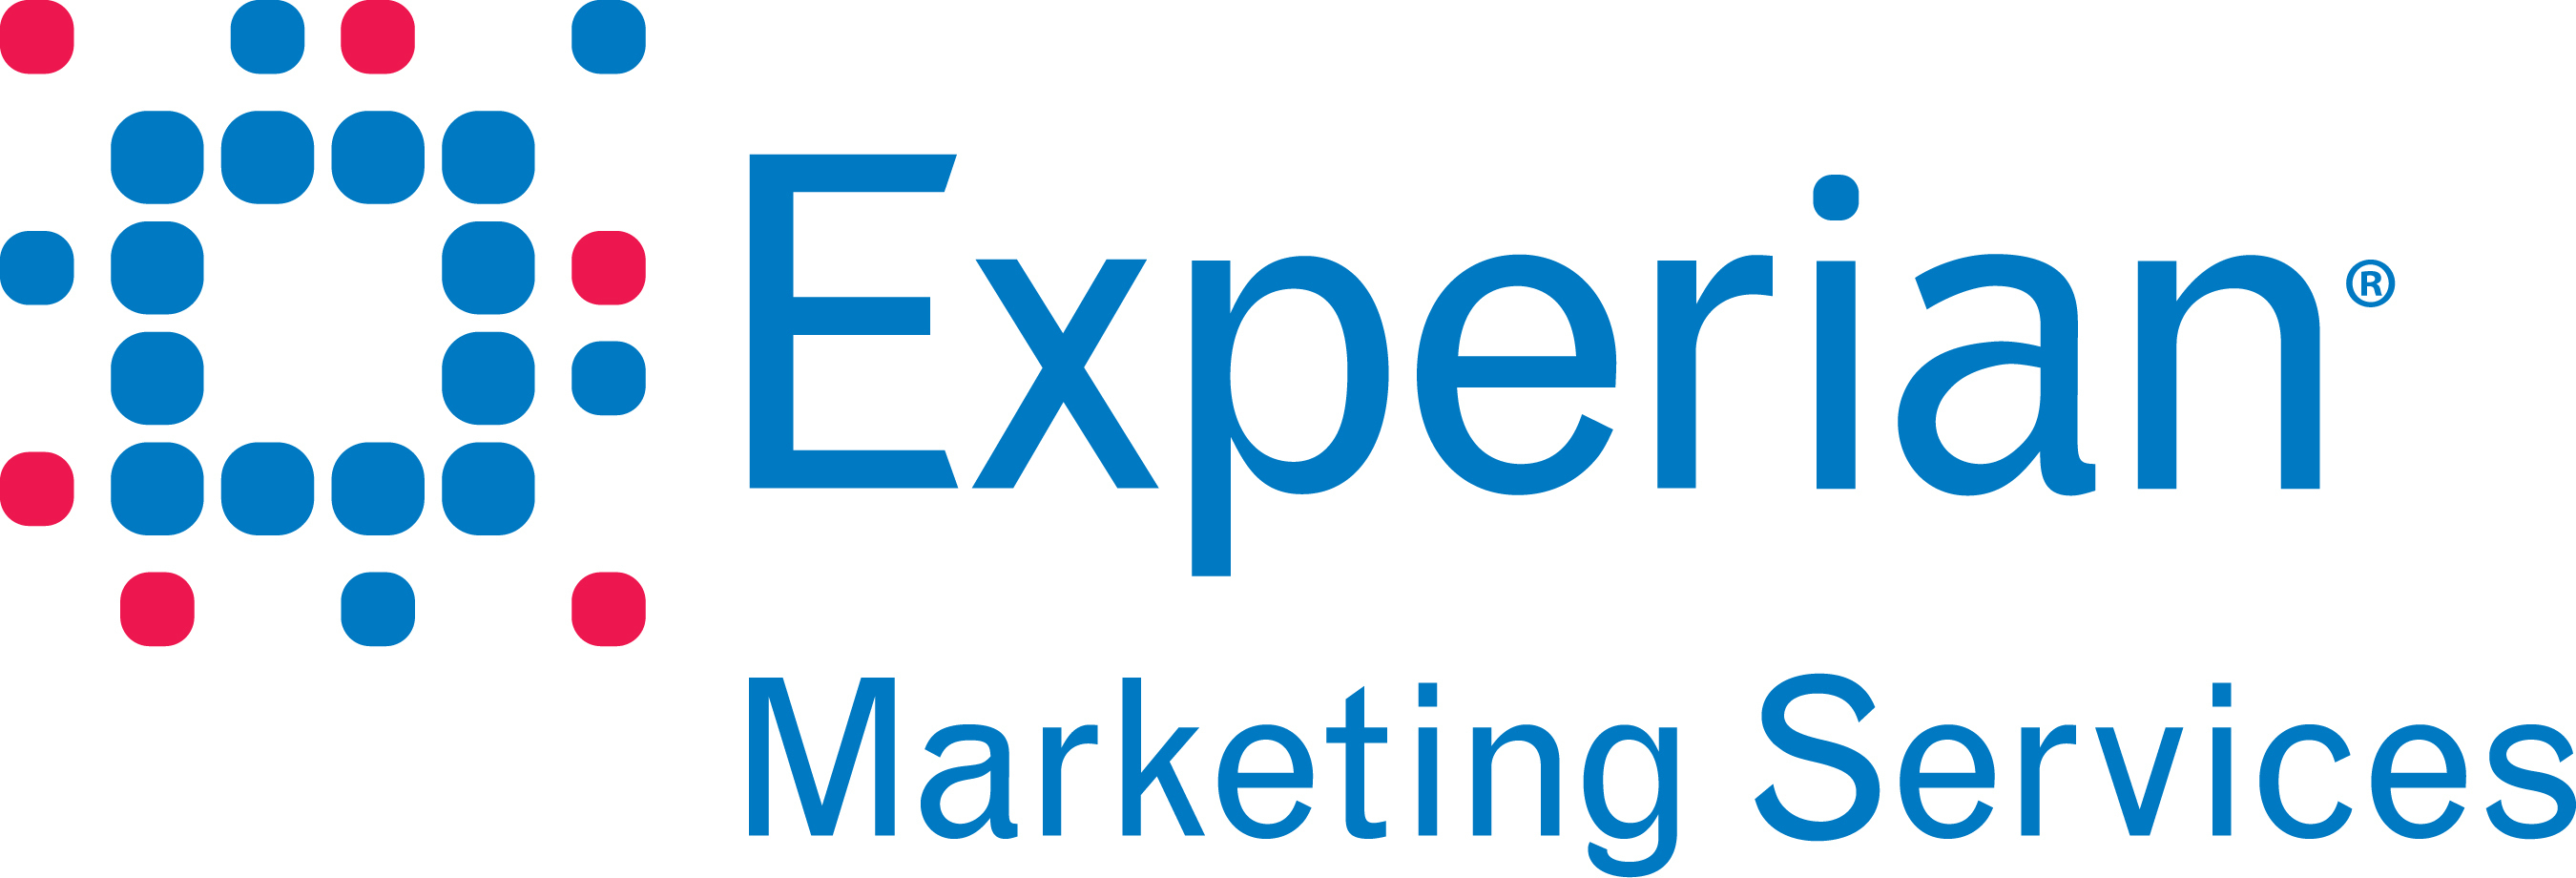 Experian Marketing Services. (PRNewsFoto/Experian)